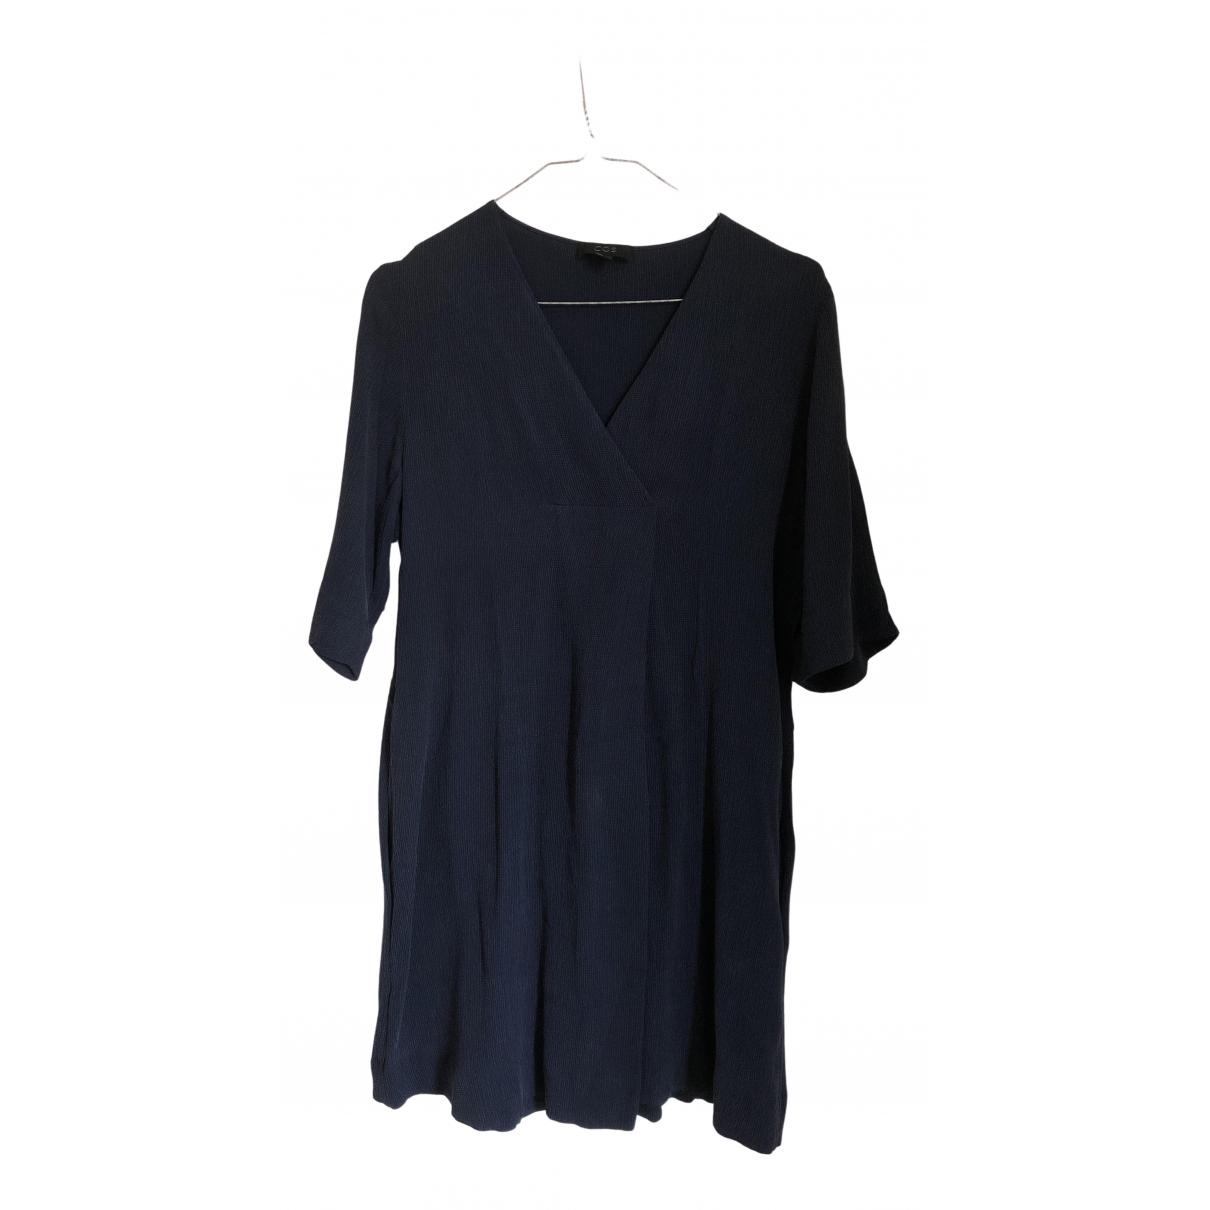 Cos N Blue Cotton dress for Women 34 FR